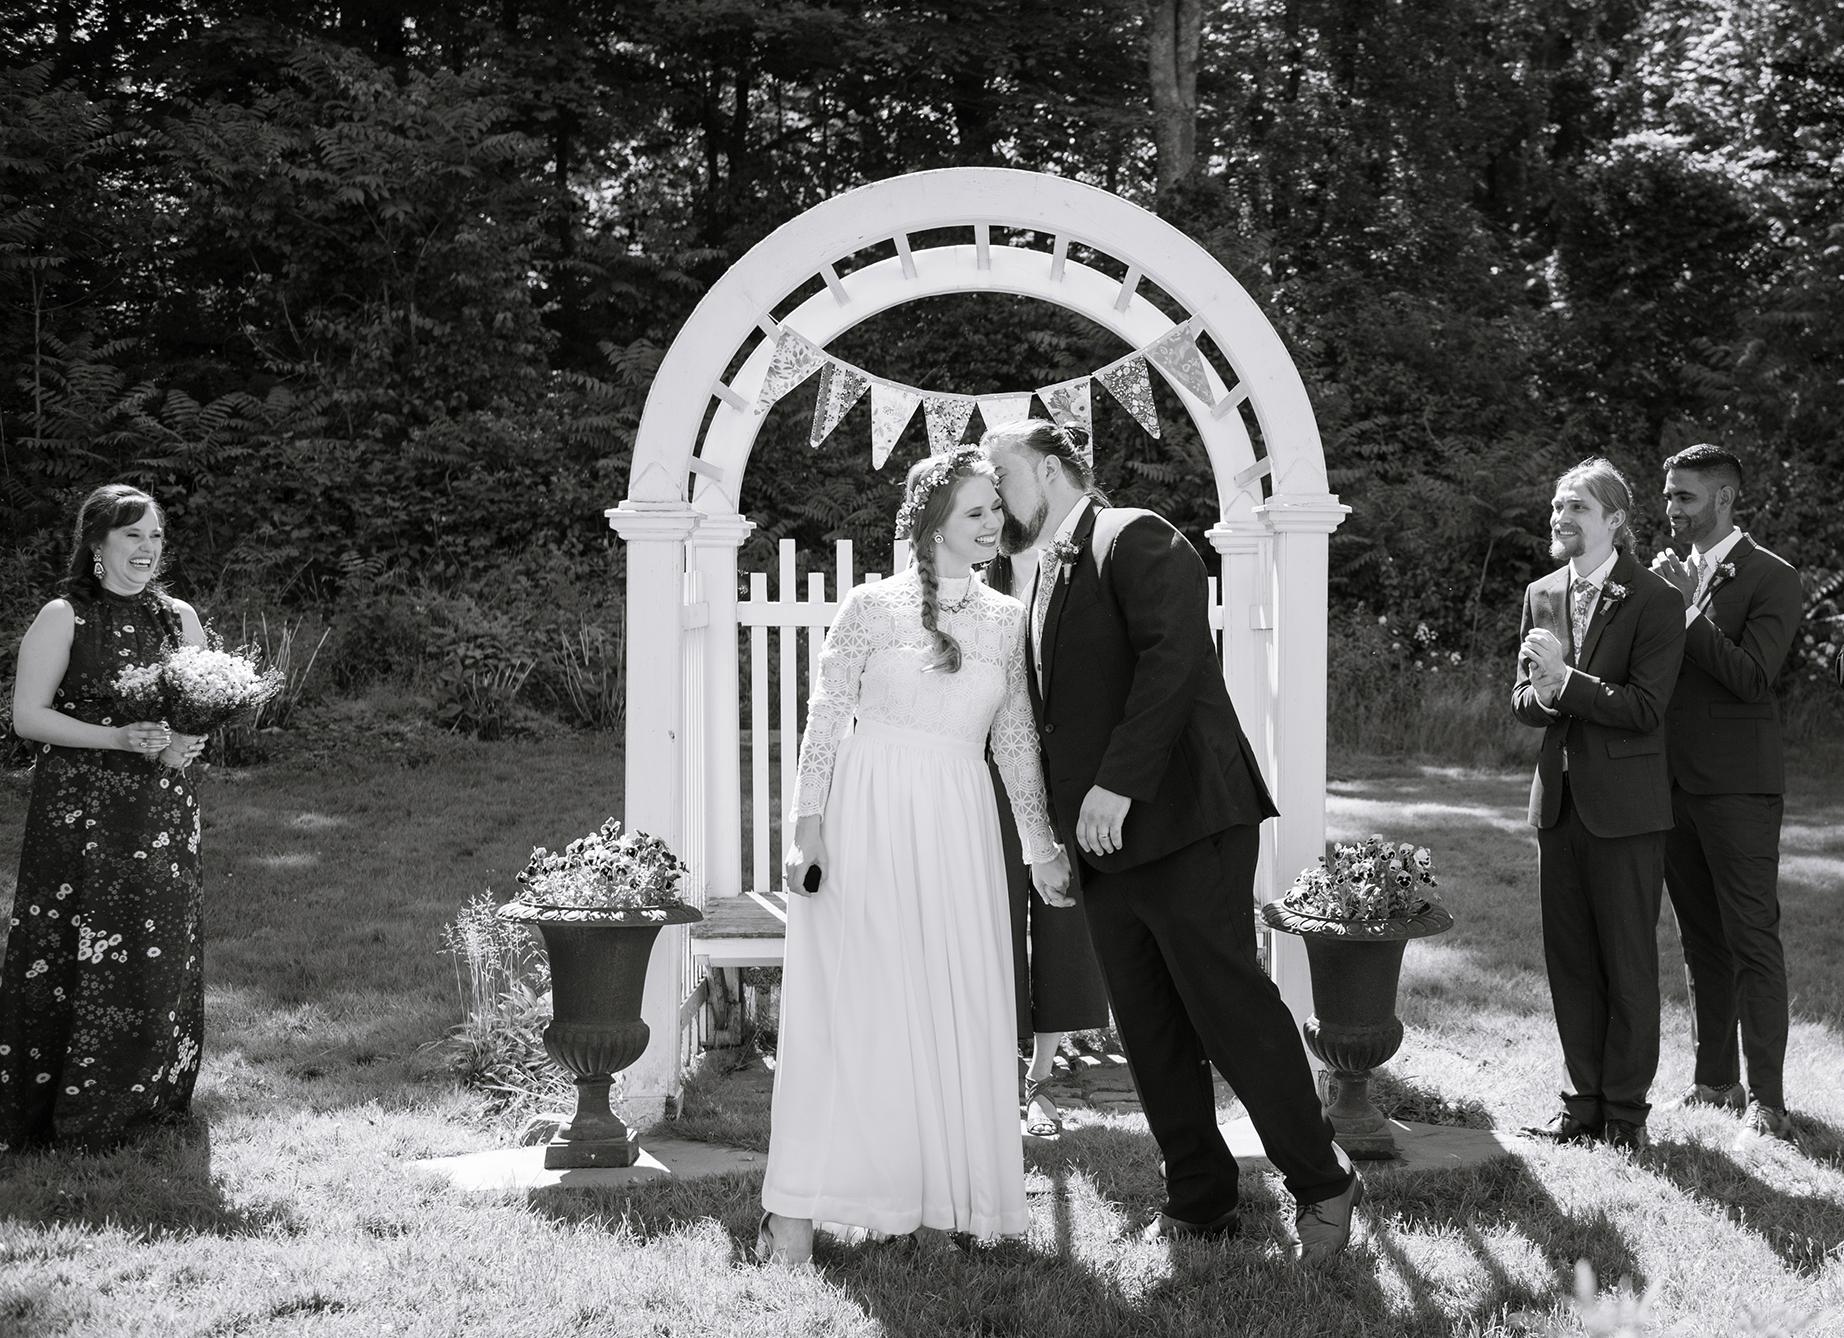 Holliston-Historical-Society-Wedding2.jpg